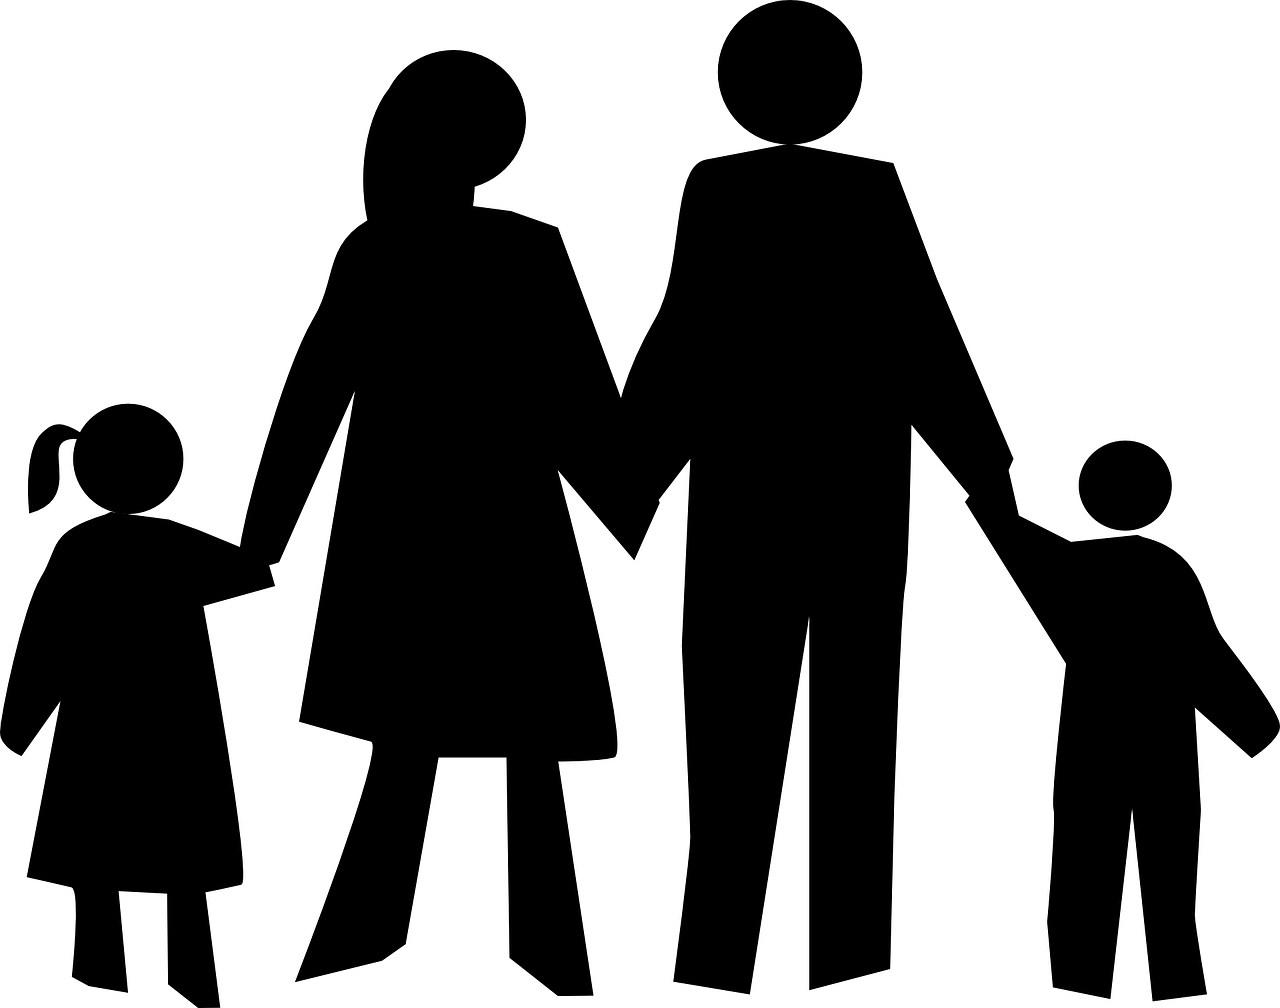 Parents, help us build a Culture of Excellence! Image